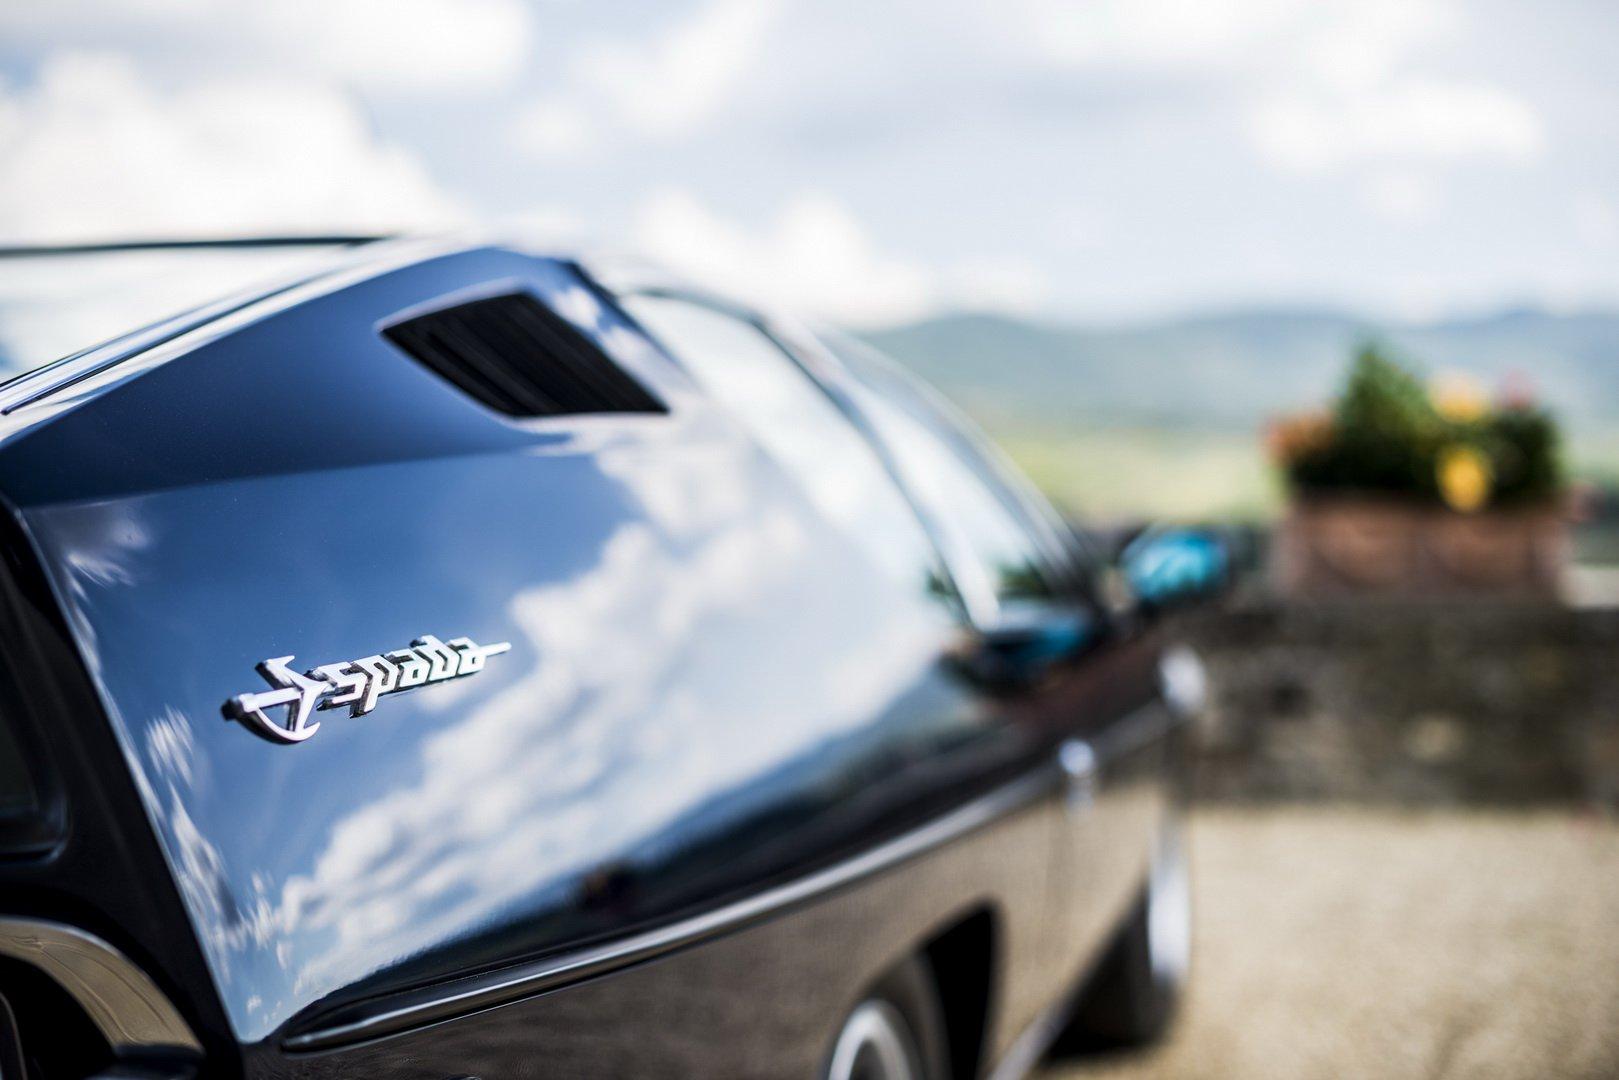 Lamborghini Islero and Espada 50th anniversary (19)